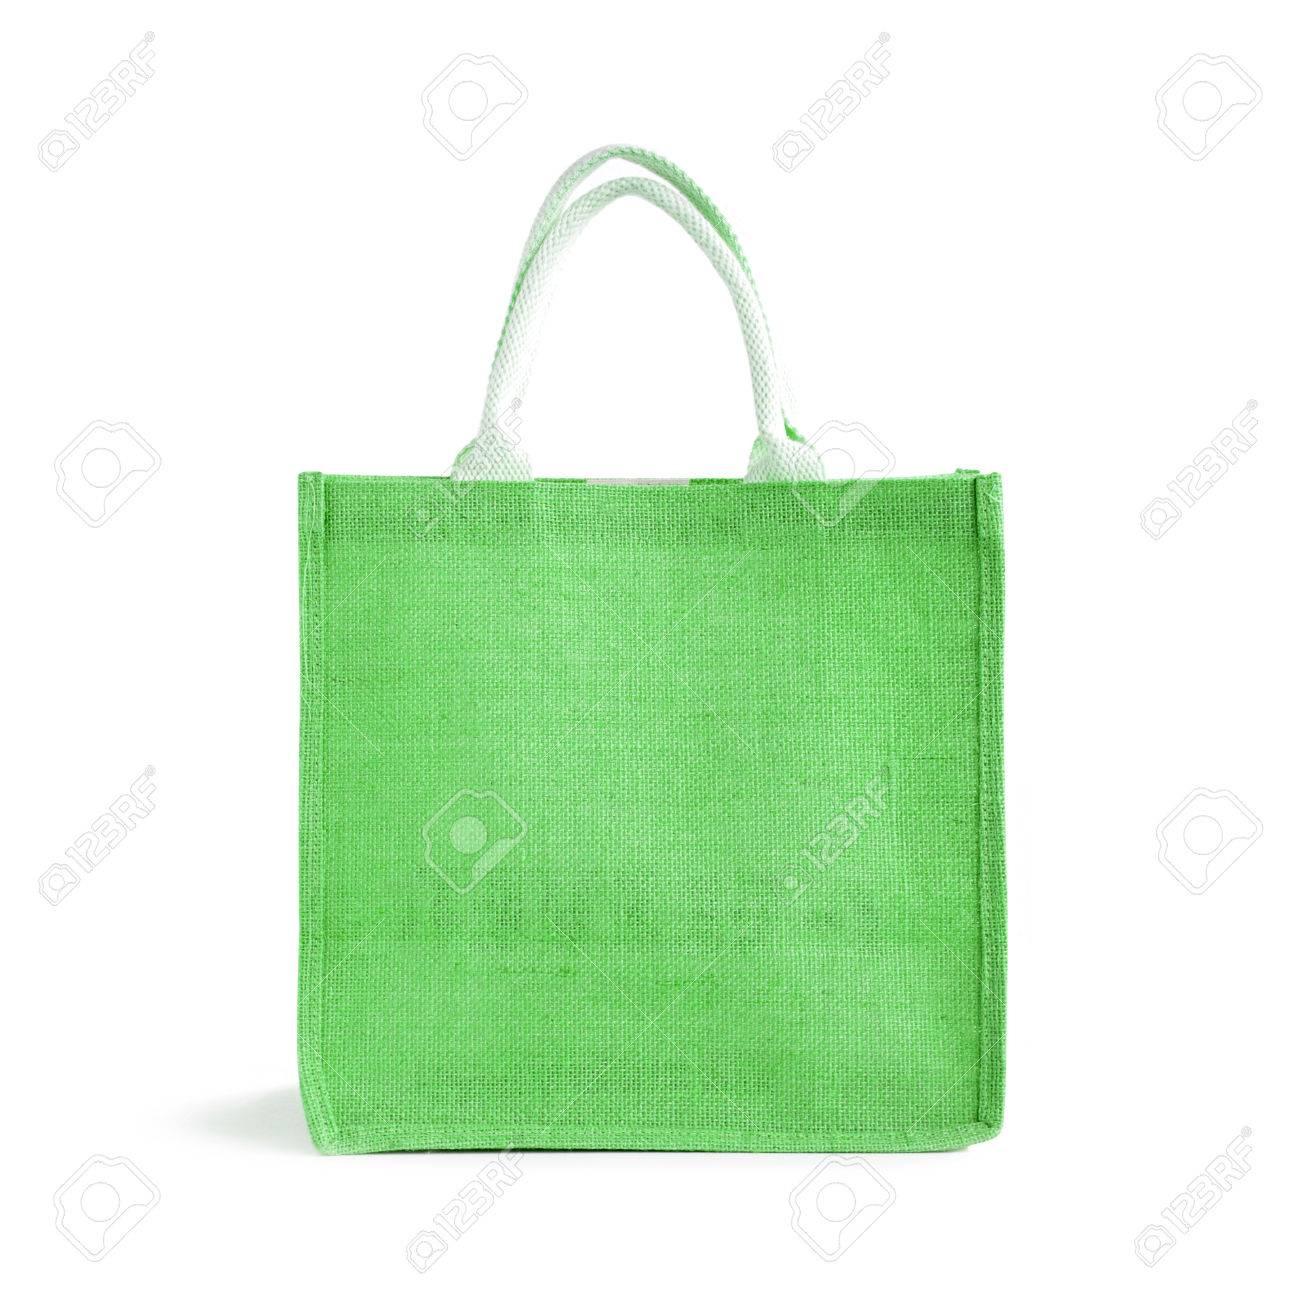 arpillera o bolsa de yute bolsa de la compra verde con bucle maneja